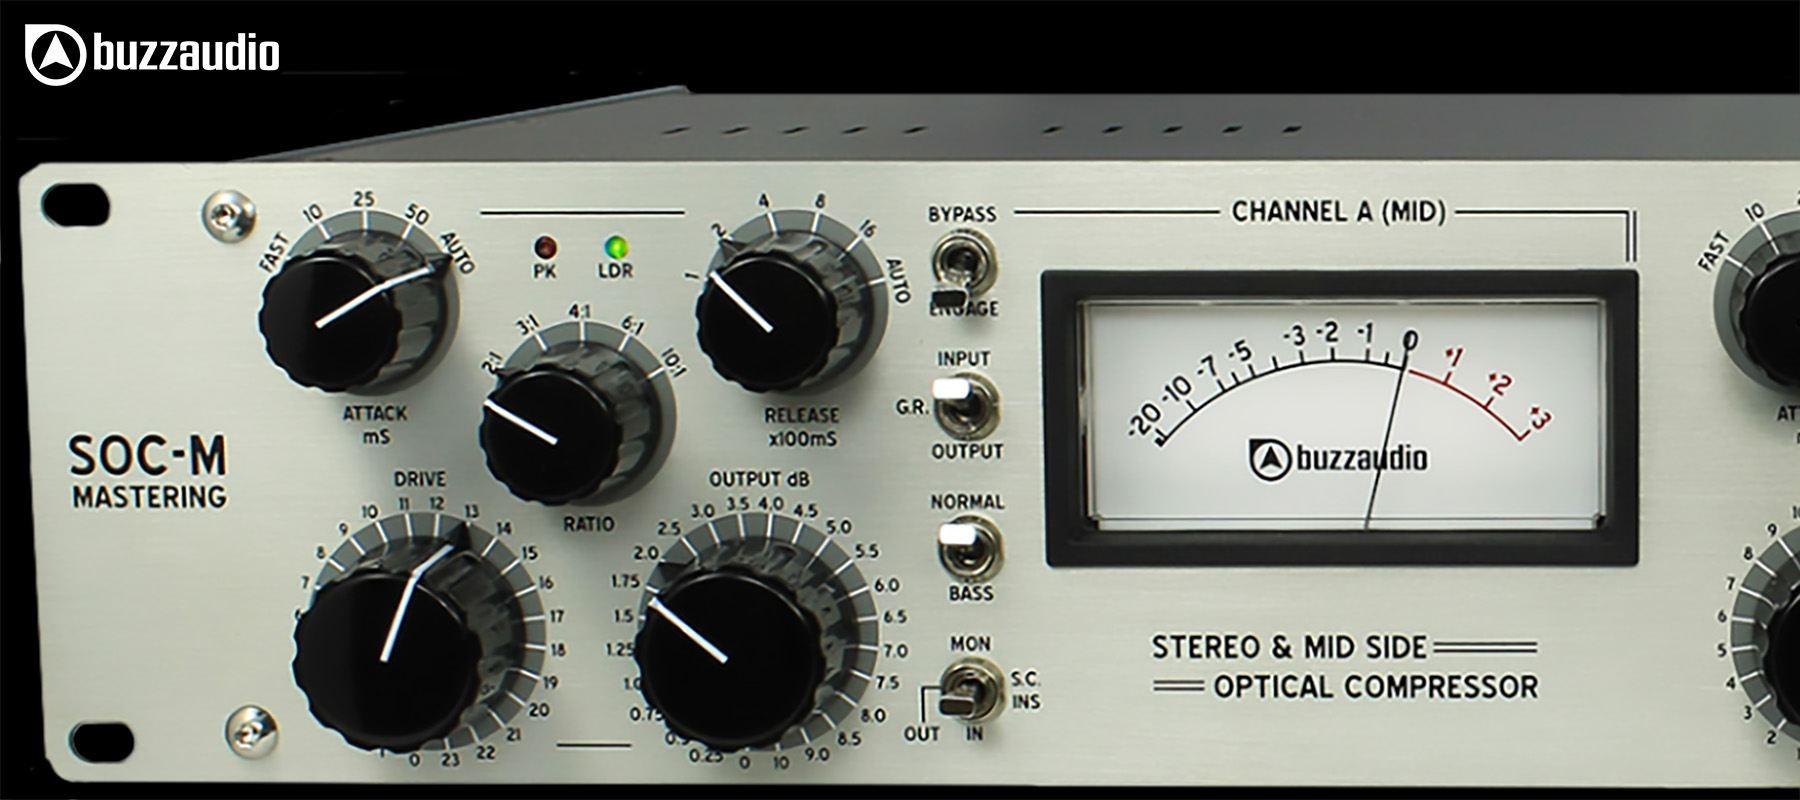 Buzz Audio SOC-M - Left commands